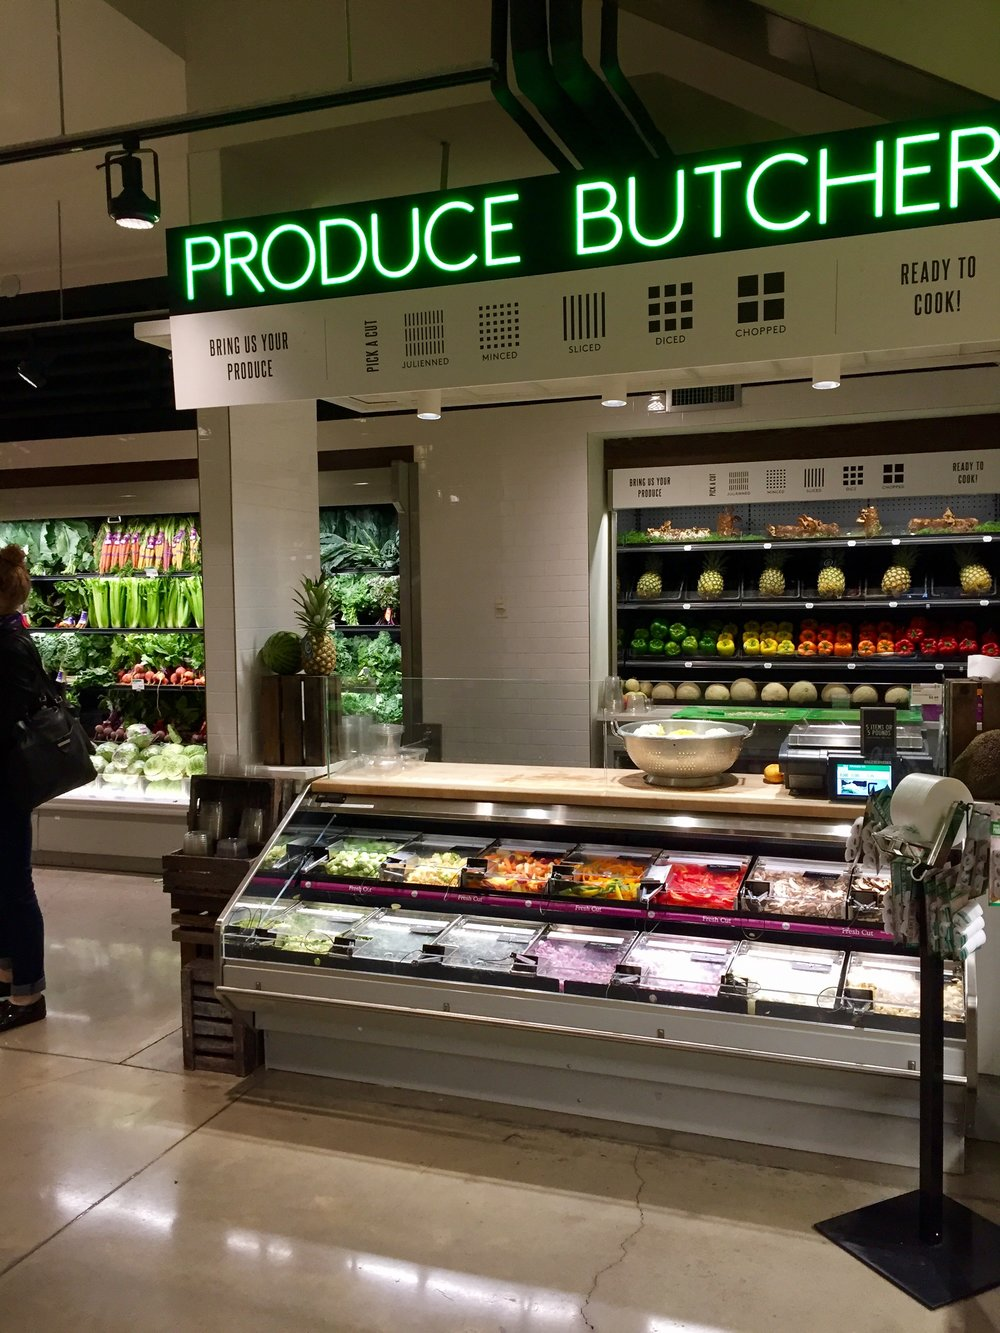 Wholefoods produce butcher.jpg